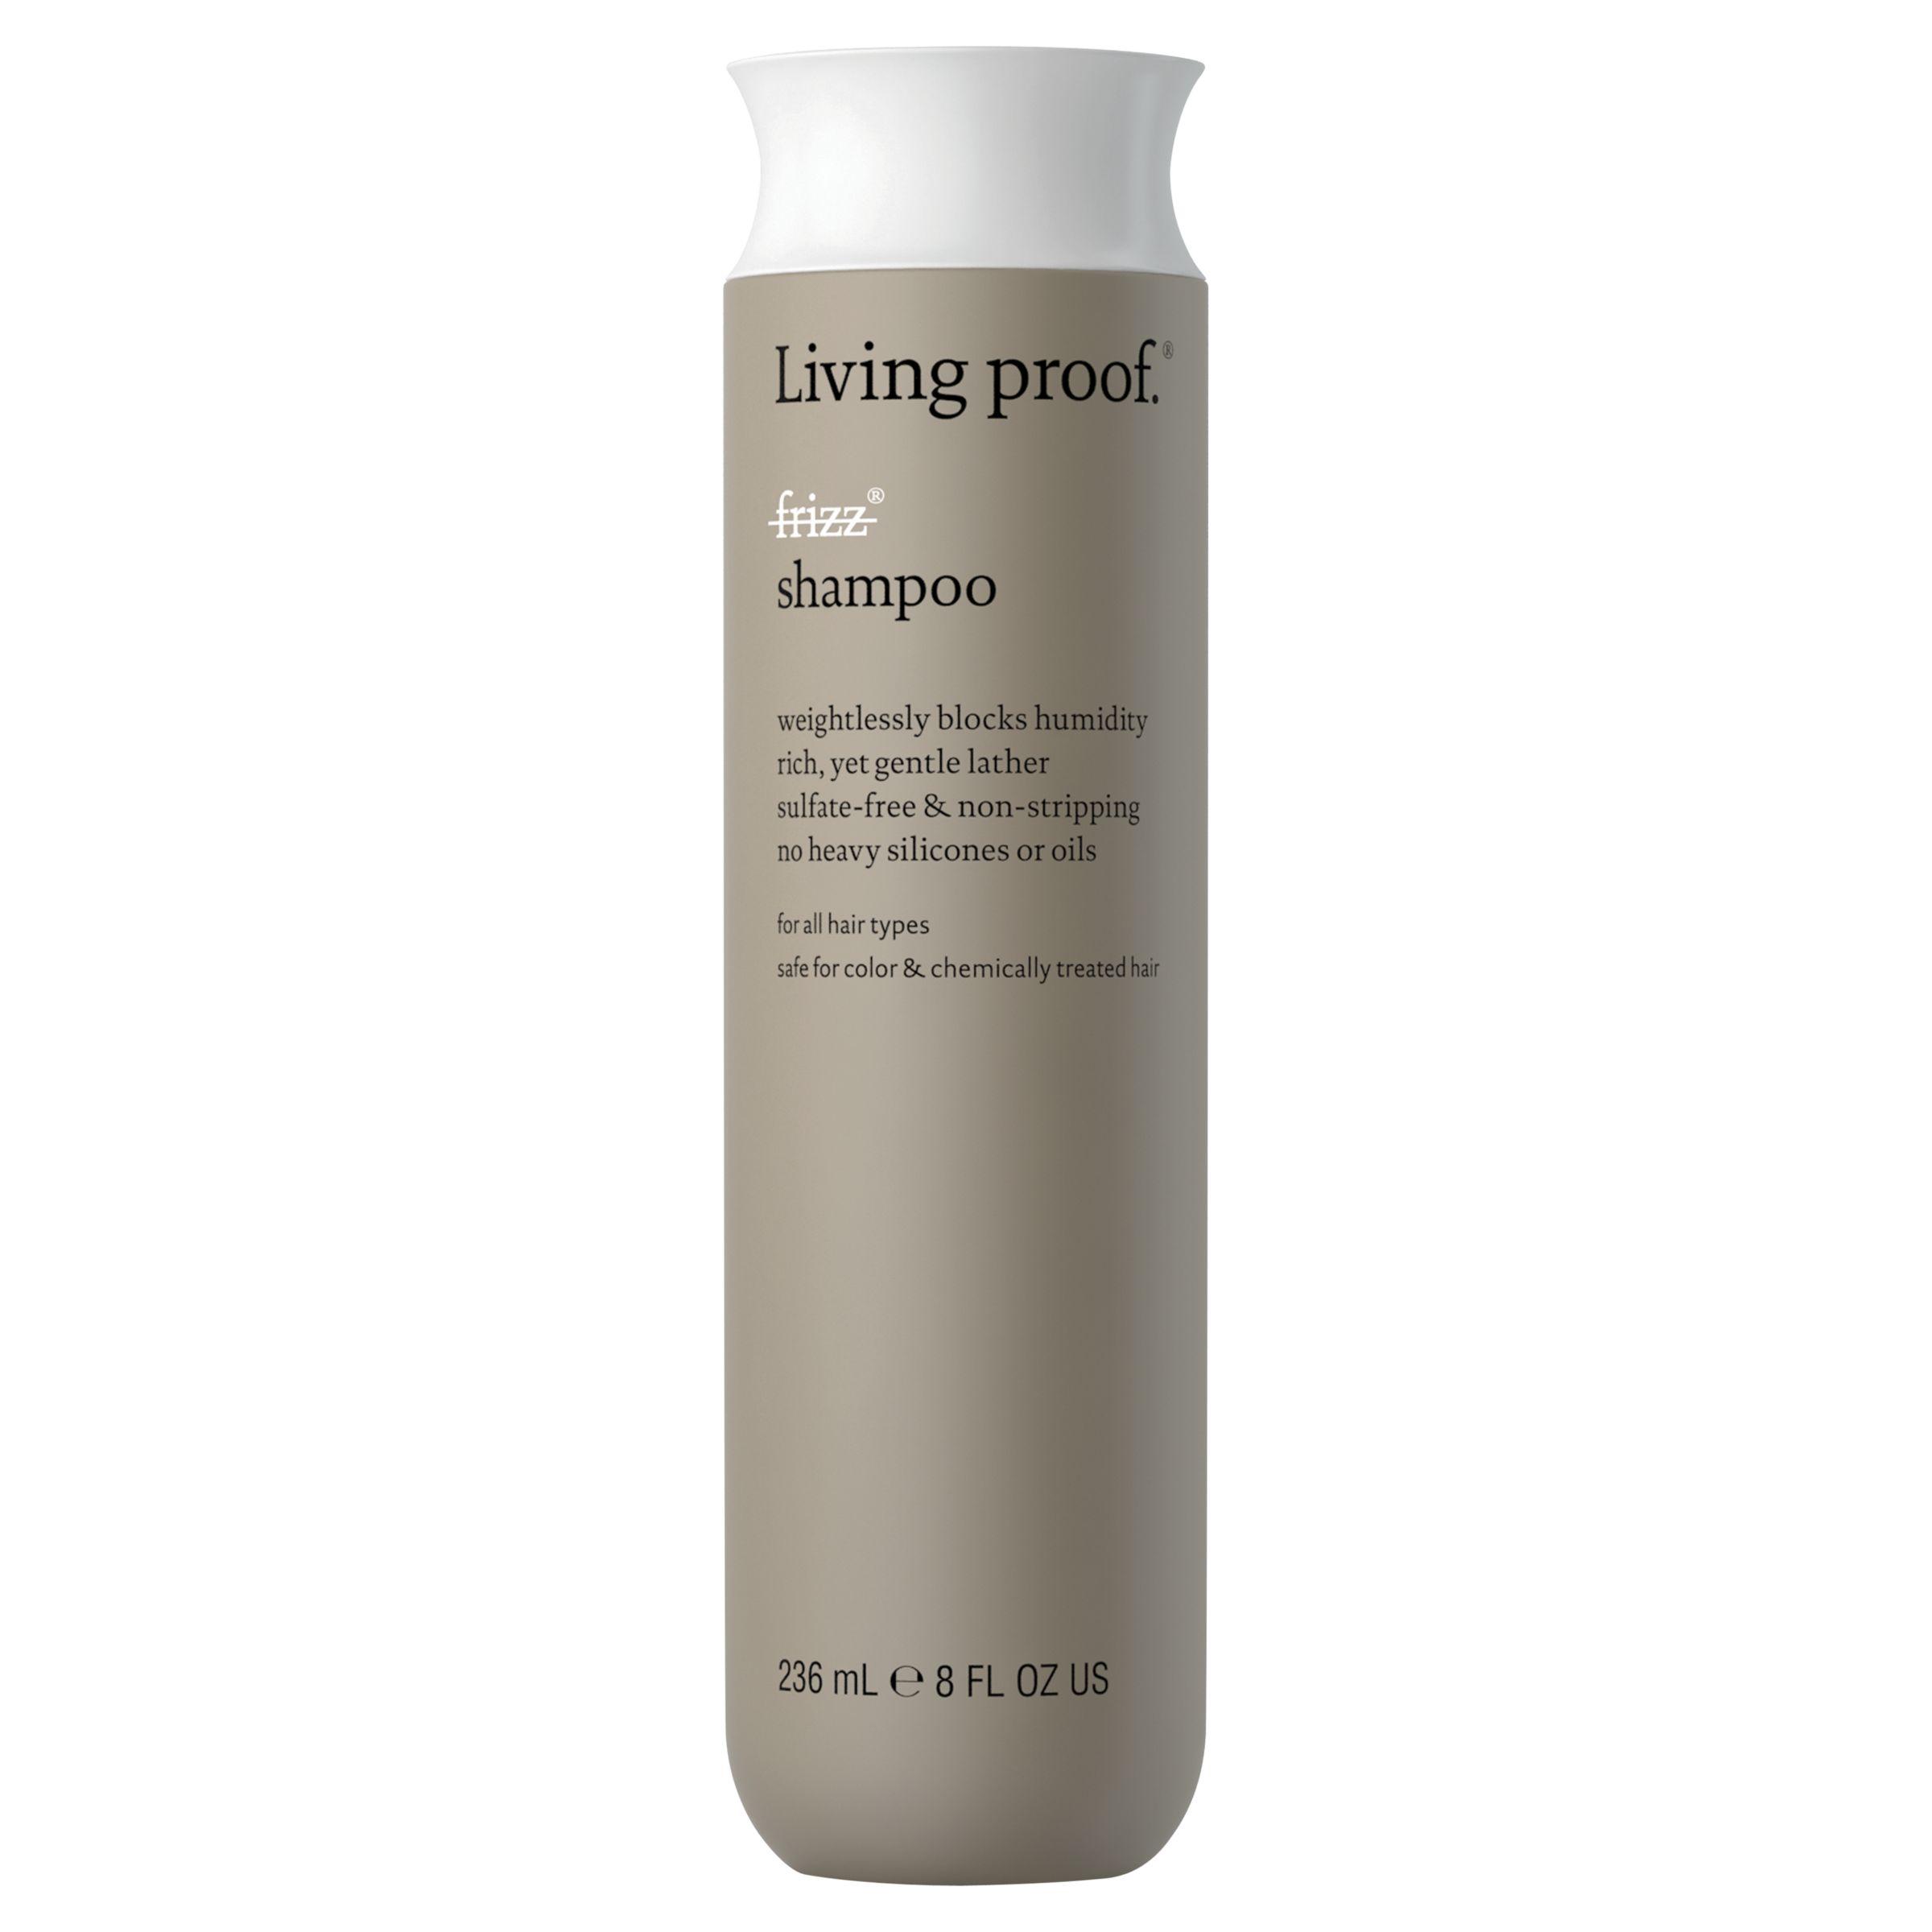 Living Proof Living Proof No Frizz Shampoo, 236ml